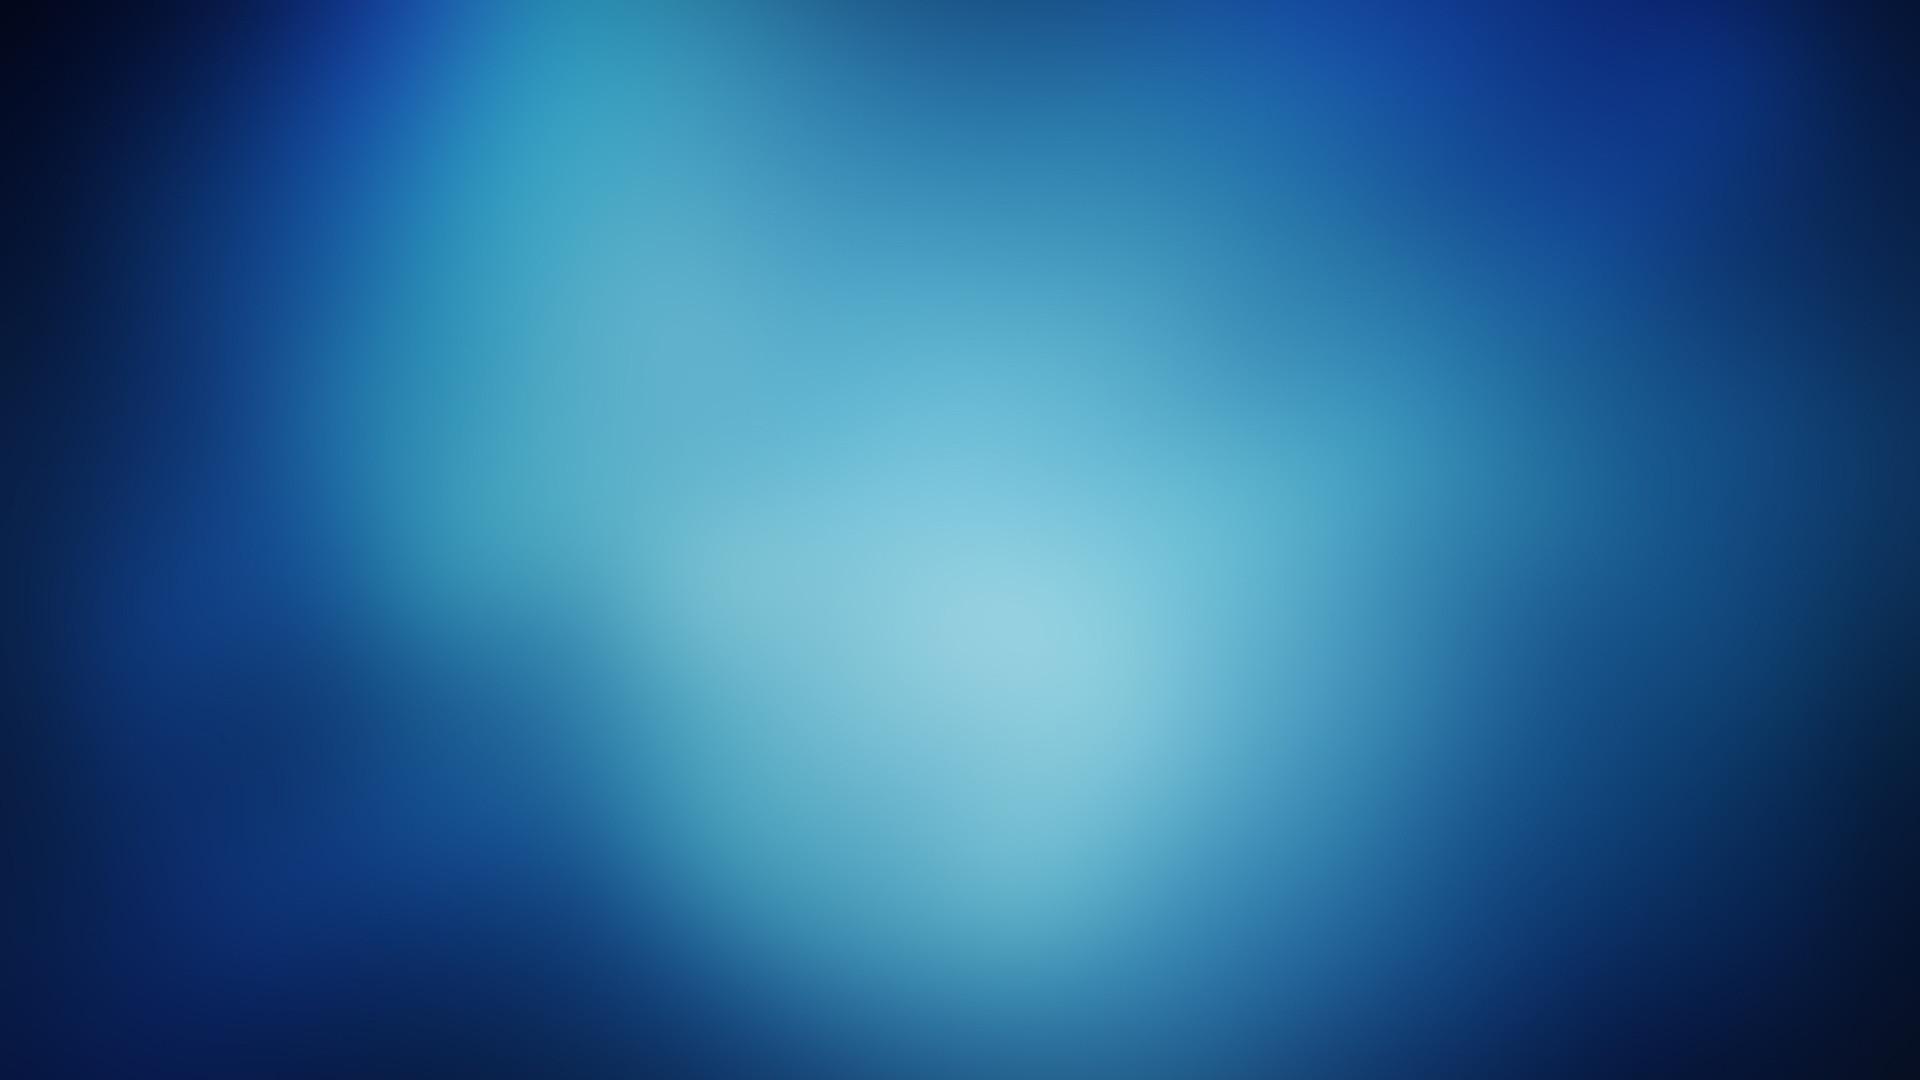 Free Blue Wallpaper and Background – WallpaperSafari